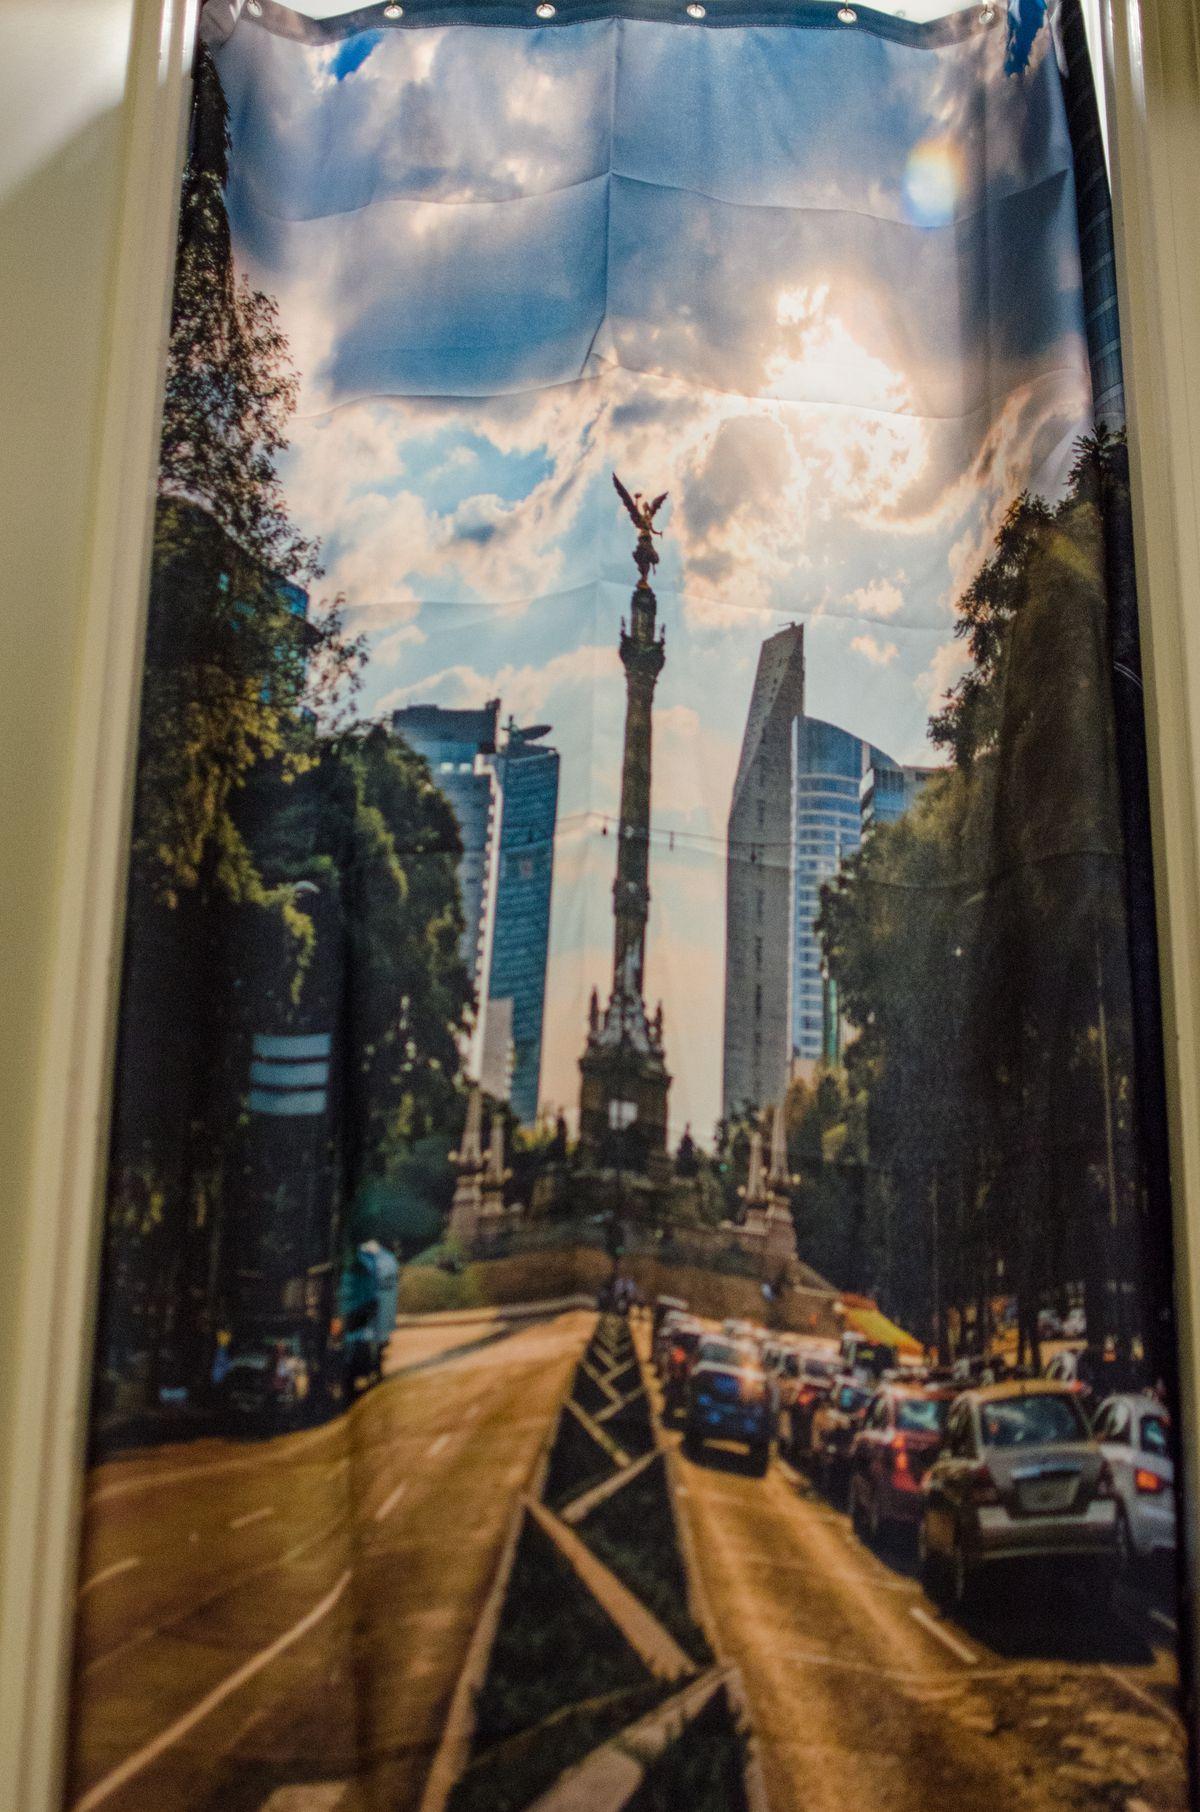 A floor-to-ceiling curtain blocking a doorway features a photograph of el Ángel de la Independencia in Mexico City